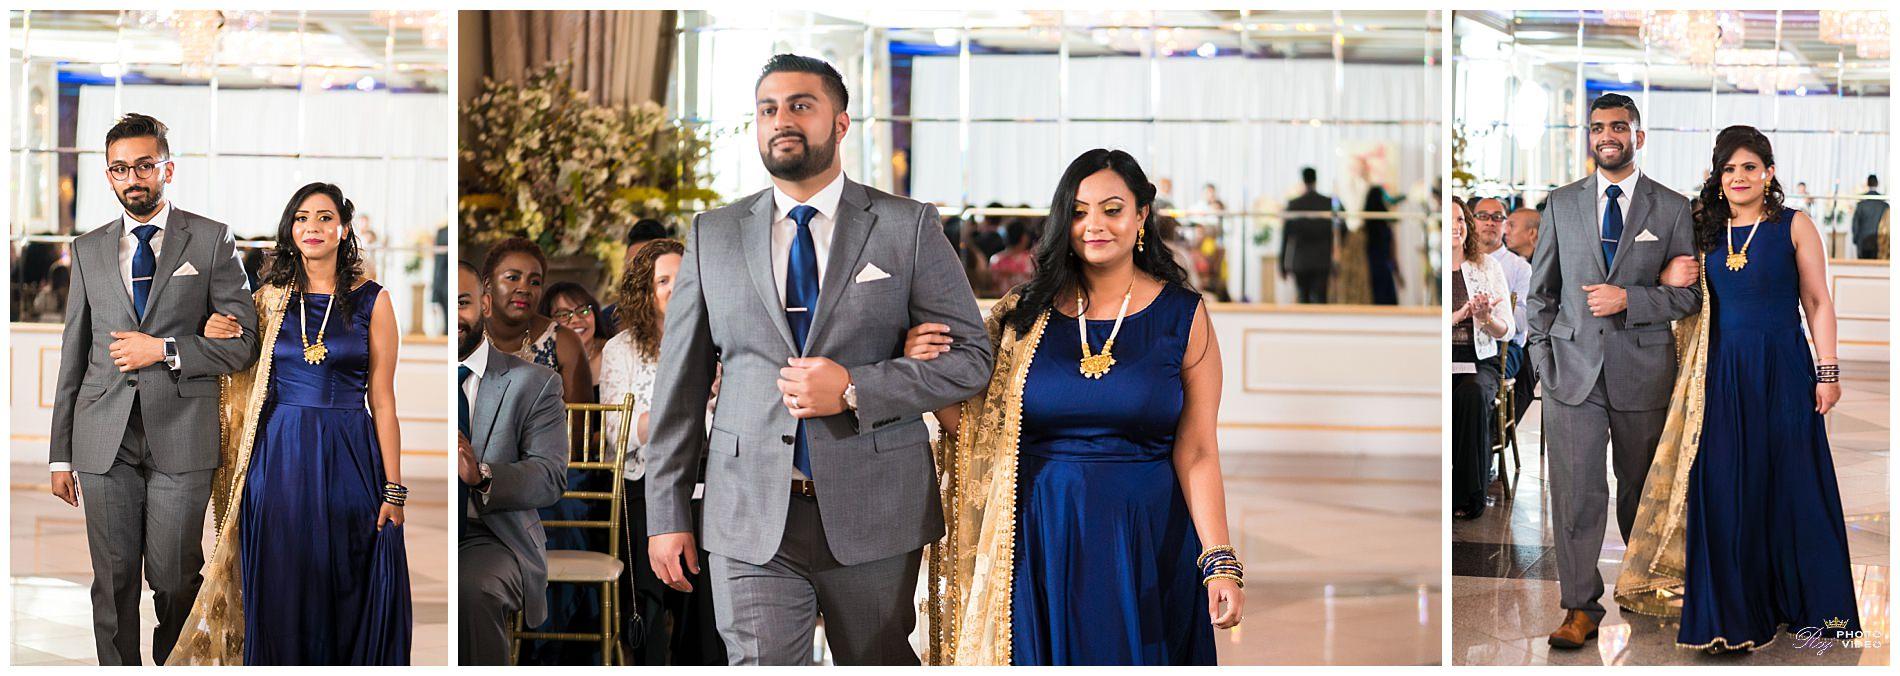 Royal-Manor-Garfield-NJ-Christian-Wedding-Ceremony-Khusbu-Jeff-37.jpg